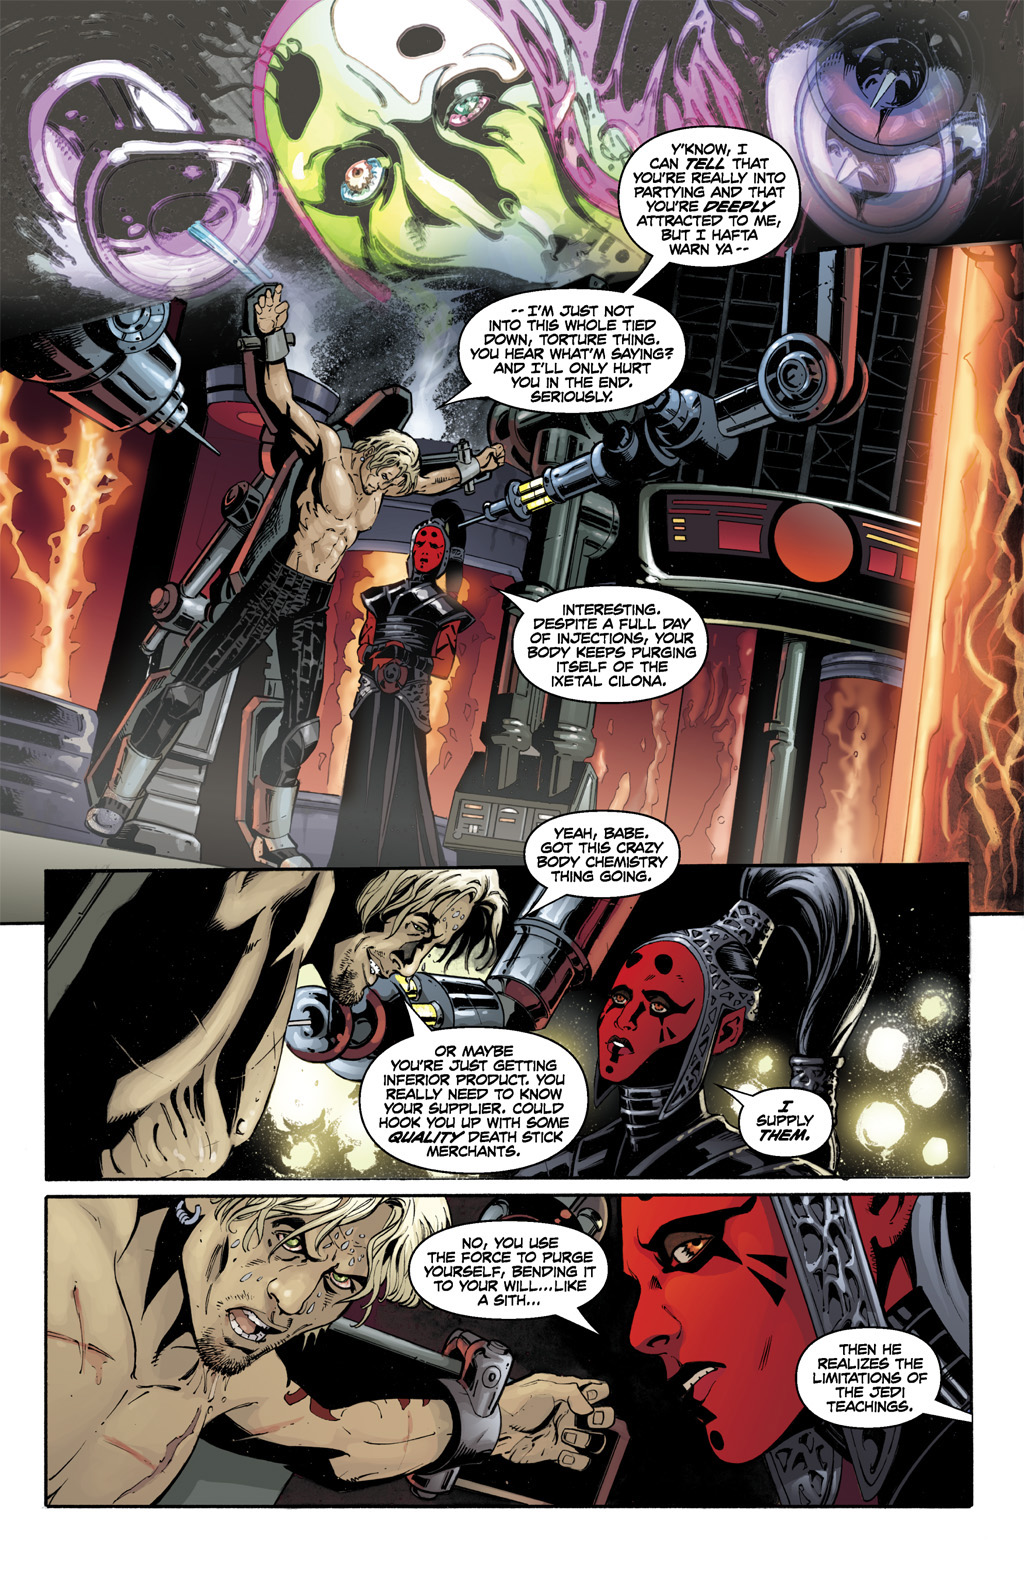 Darth Maladi Tortures Cade Skywalker